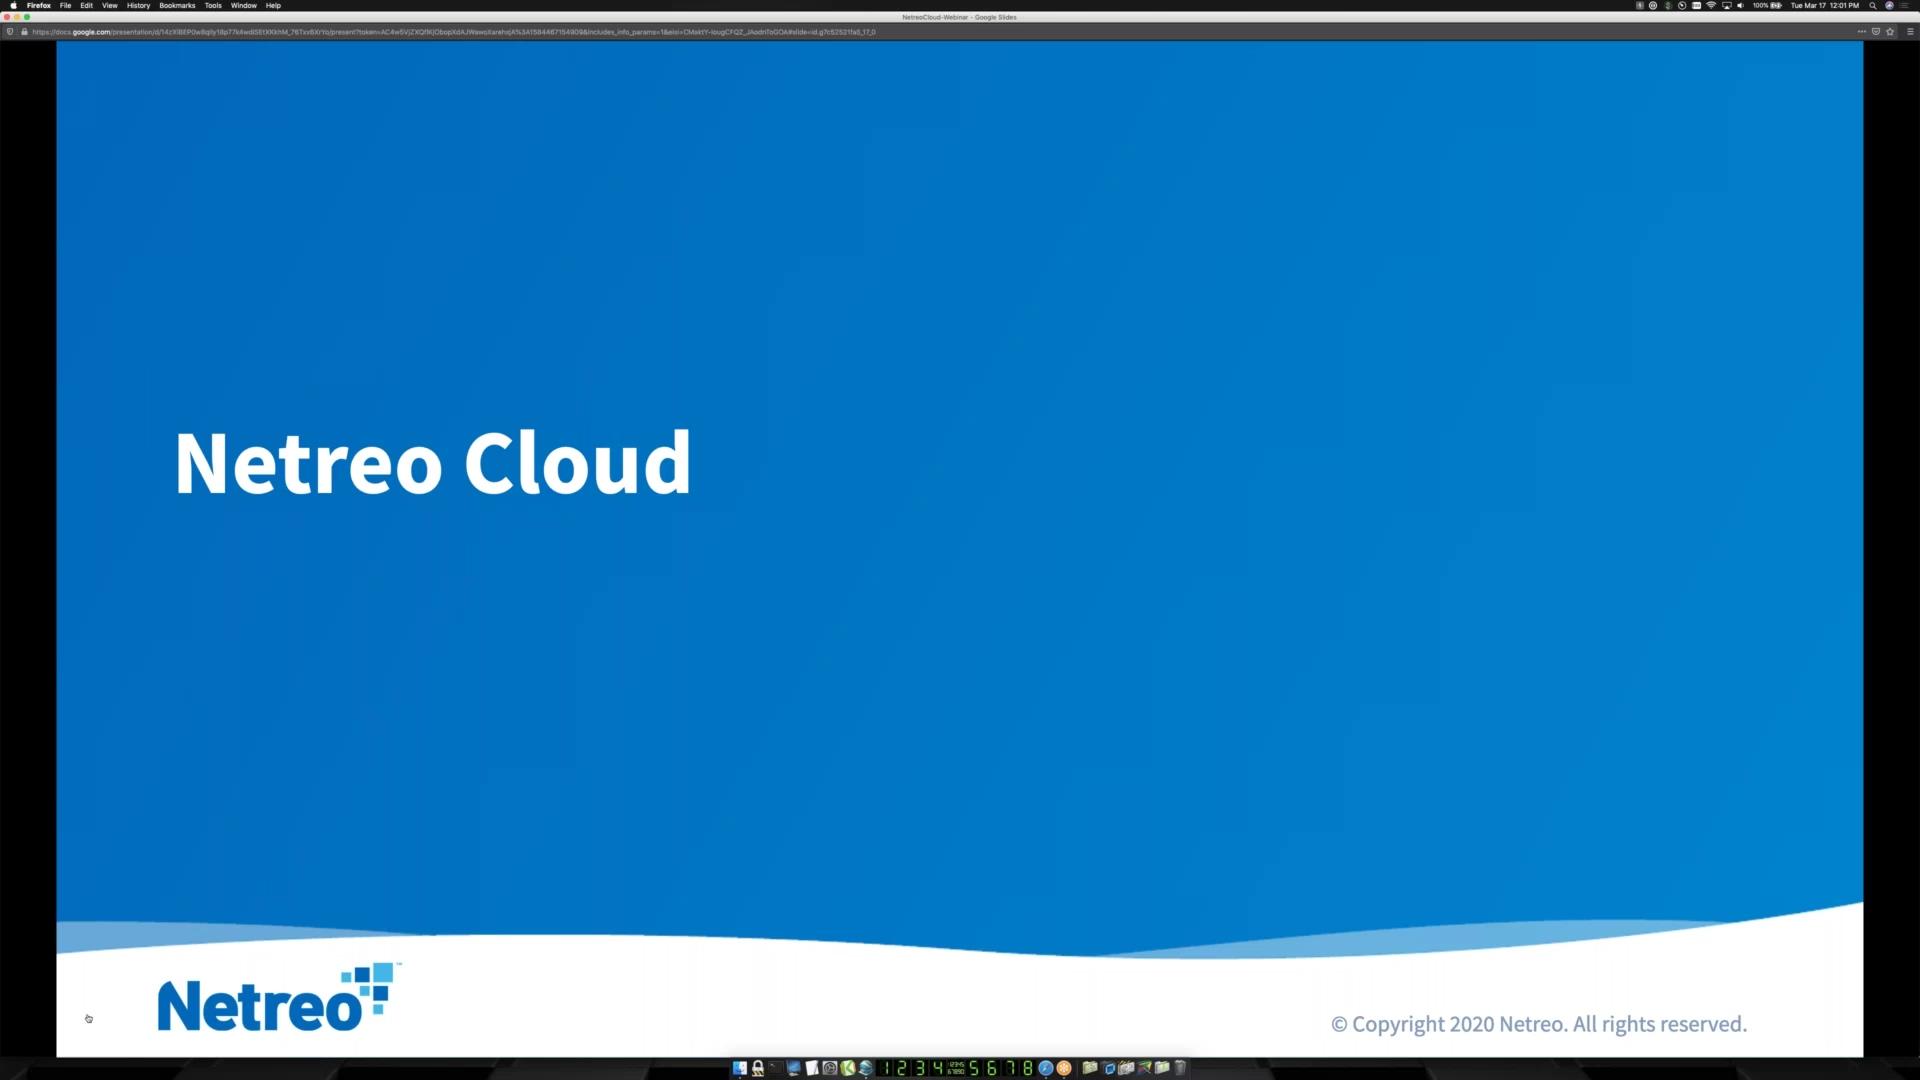 Introducing Netreo Cloud